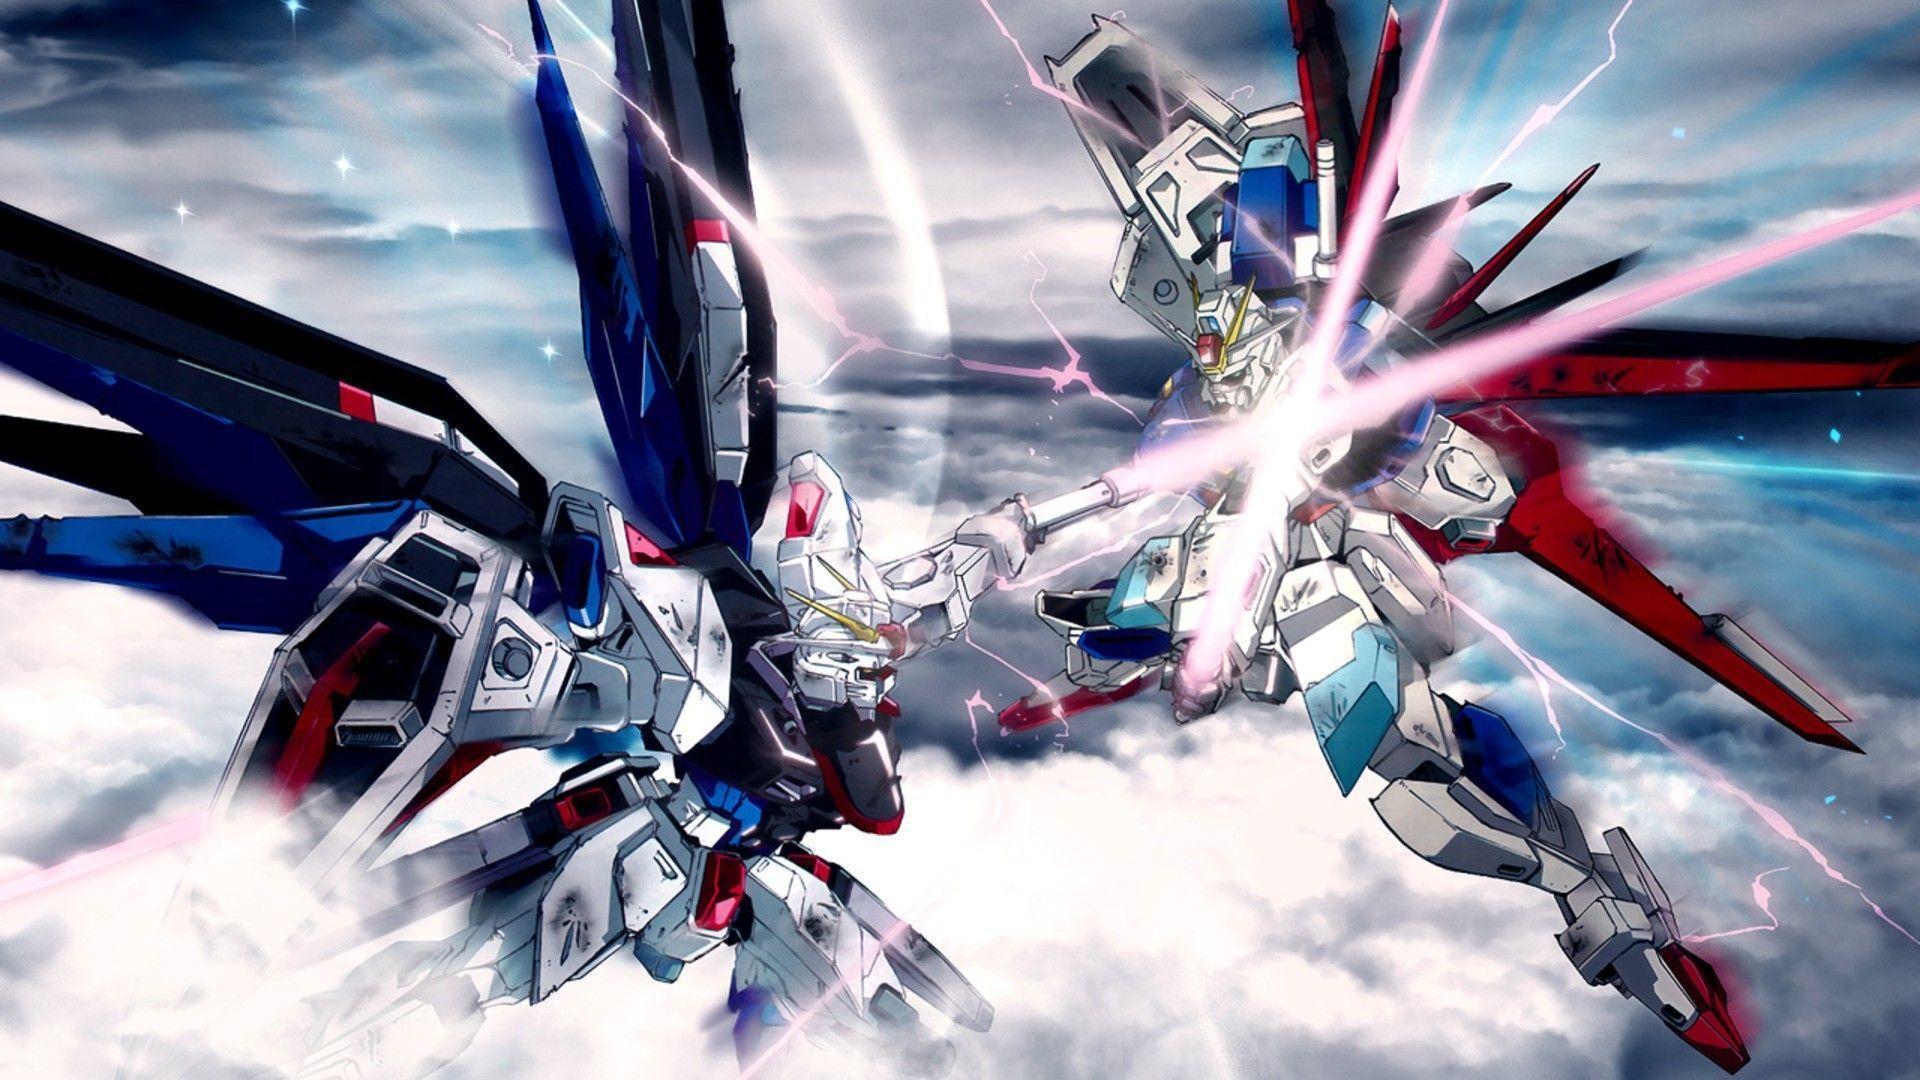 Gundam Seed Wallpapers 1920x1080